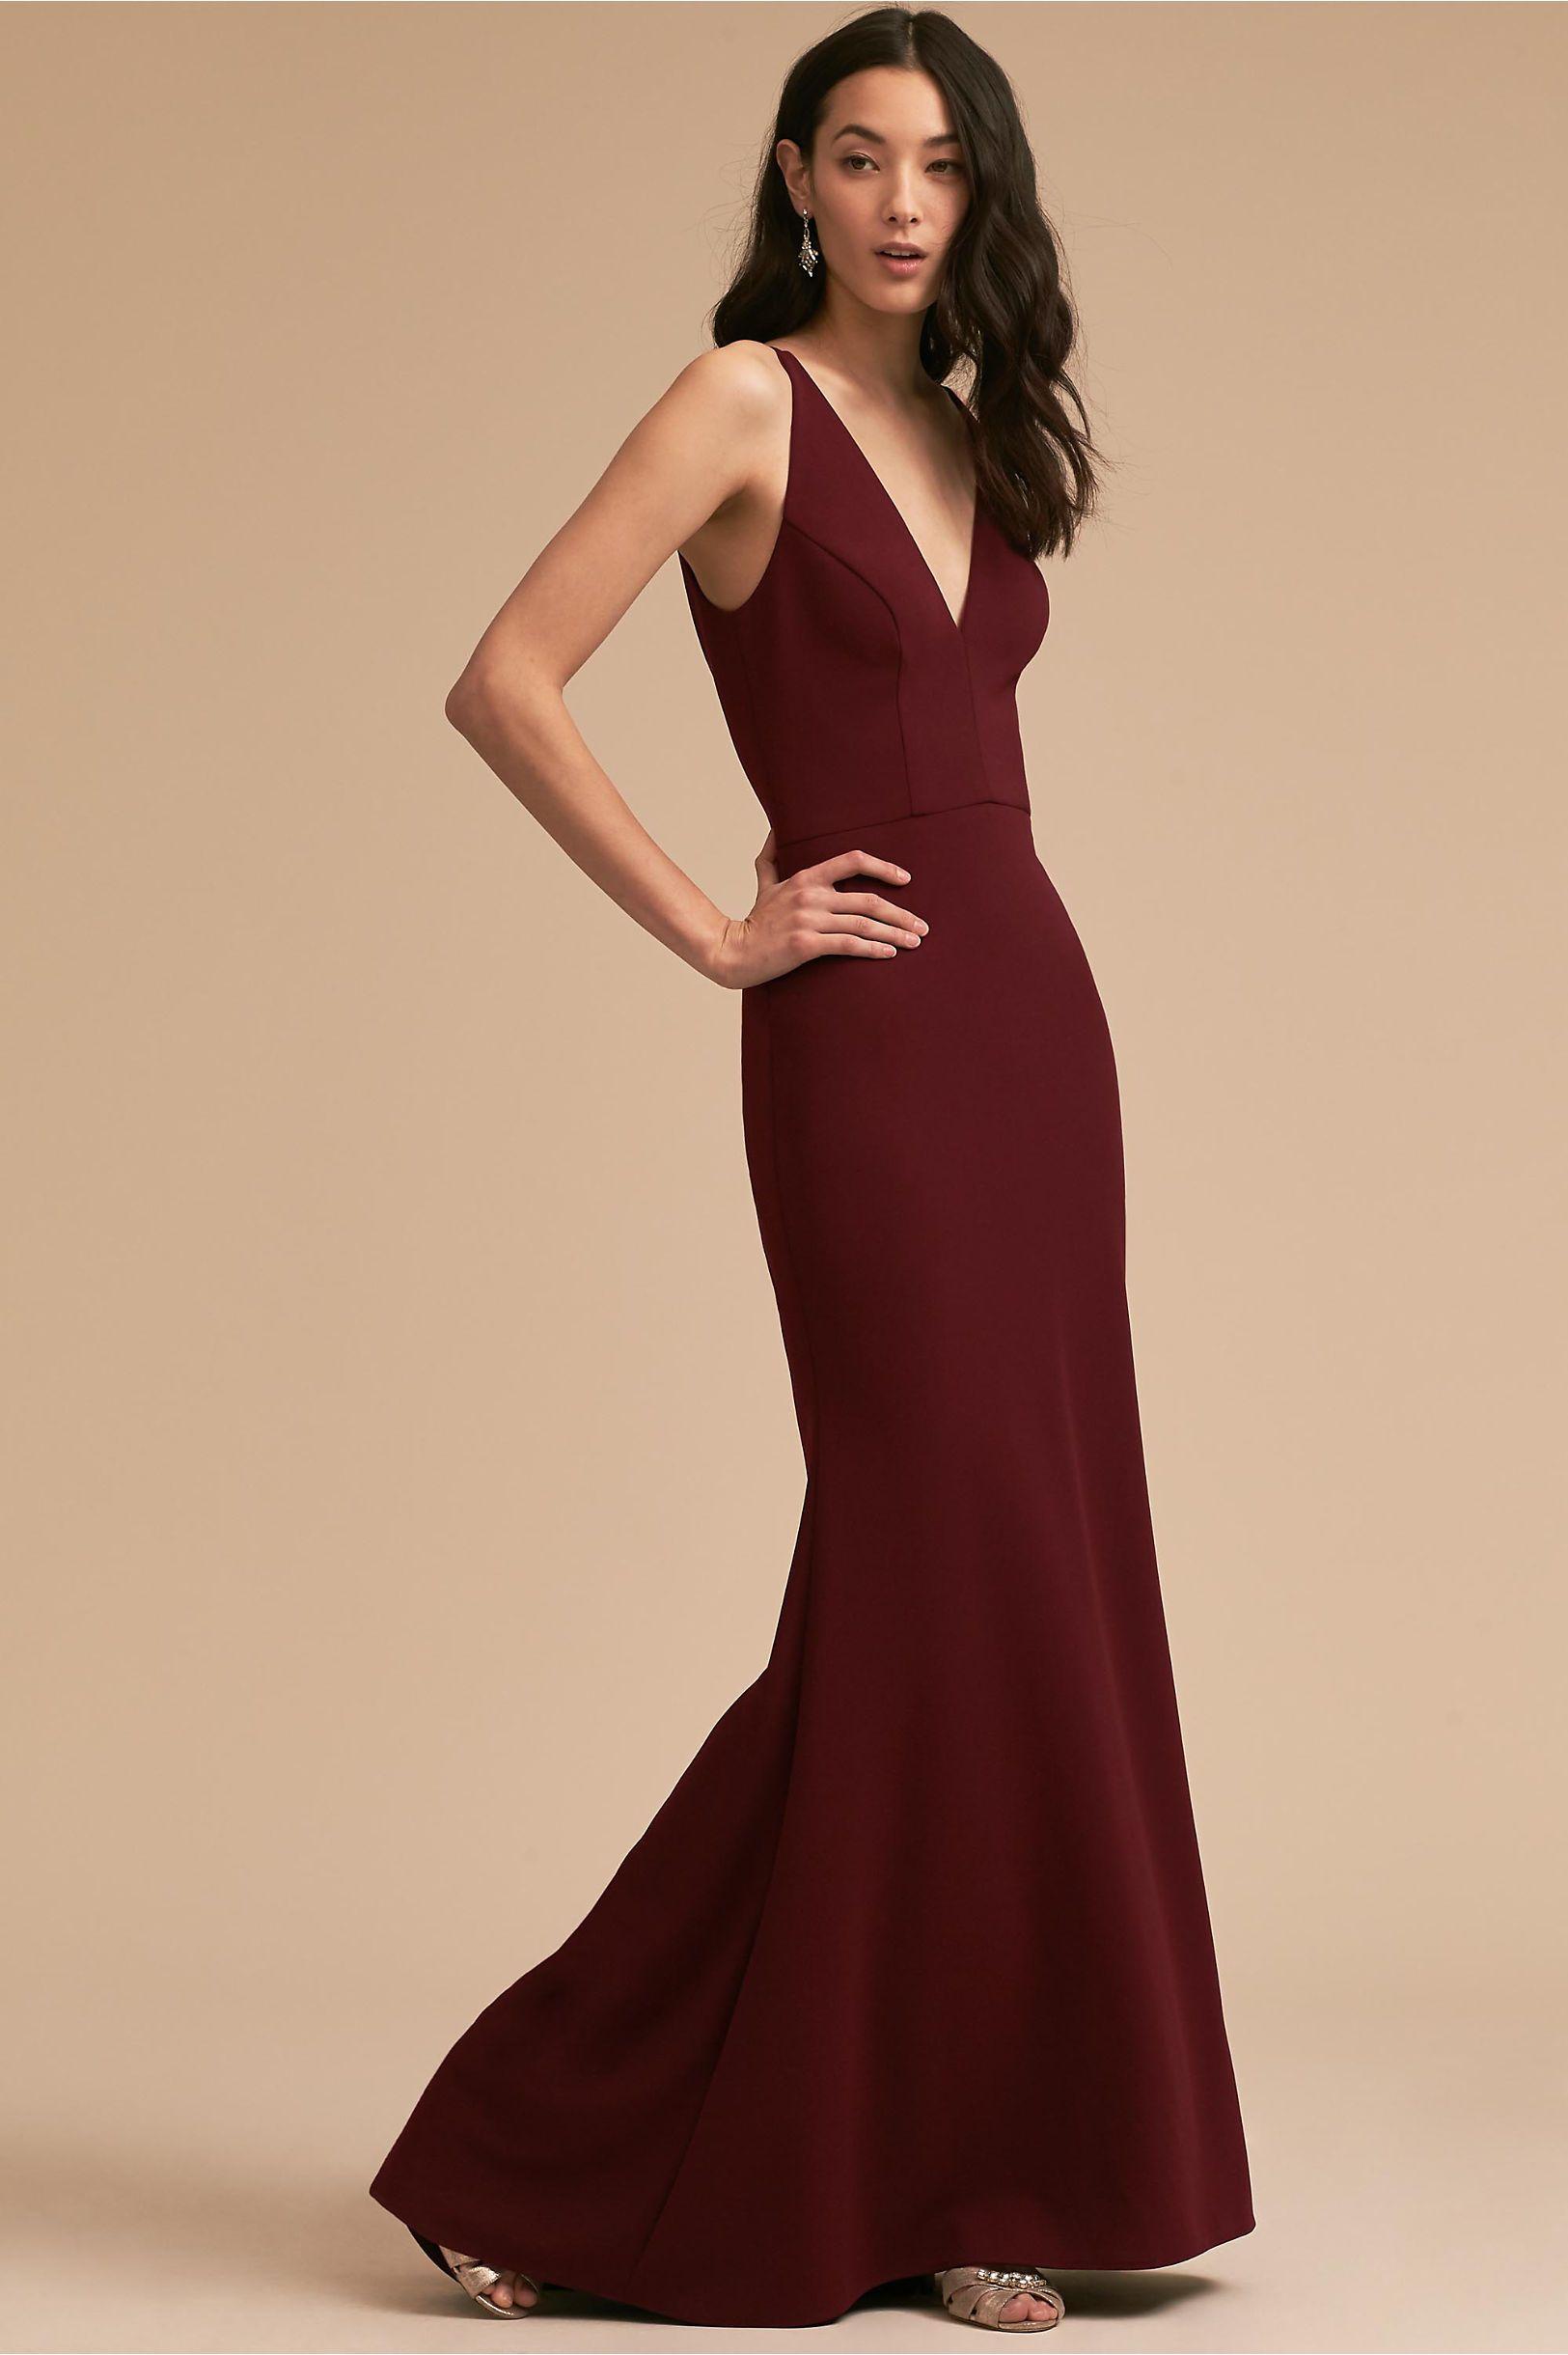 Dress for wedding party female  BHLDN Jones Dress Burgundy in Bridal Party  BHLDN  Gowns